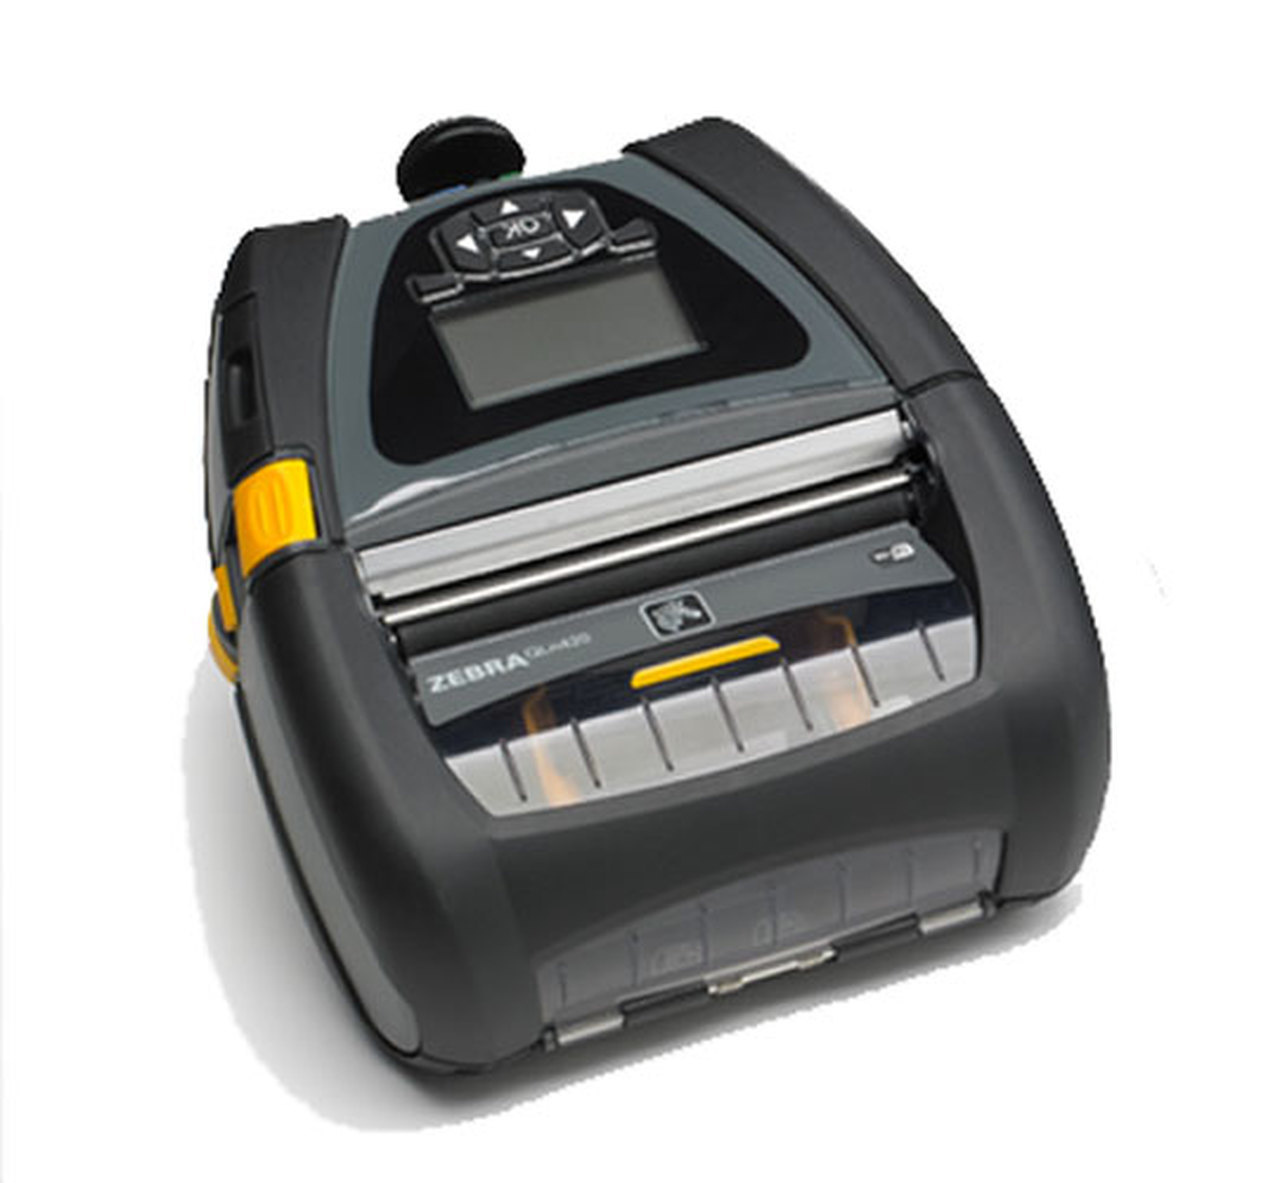 Zebra QLN420 Portable Printers